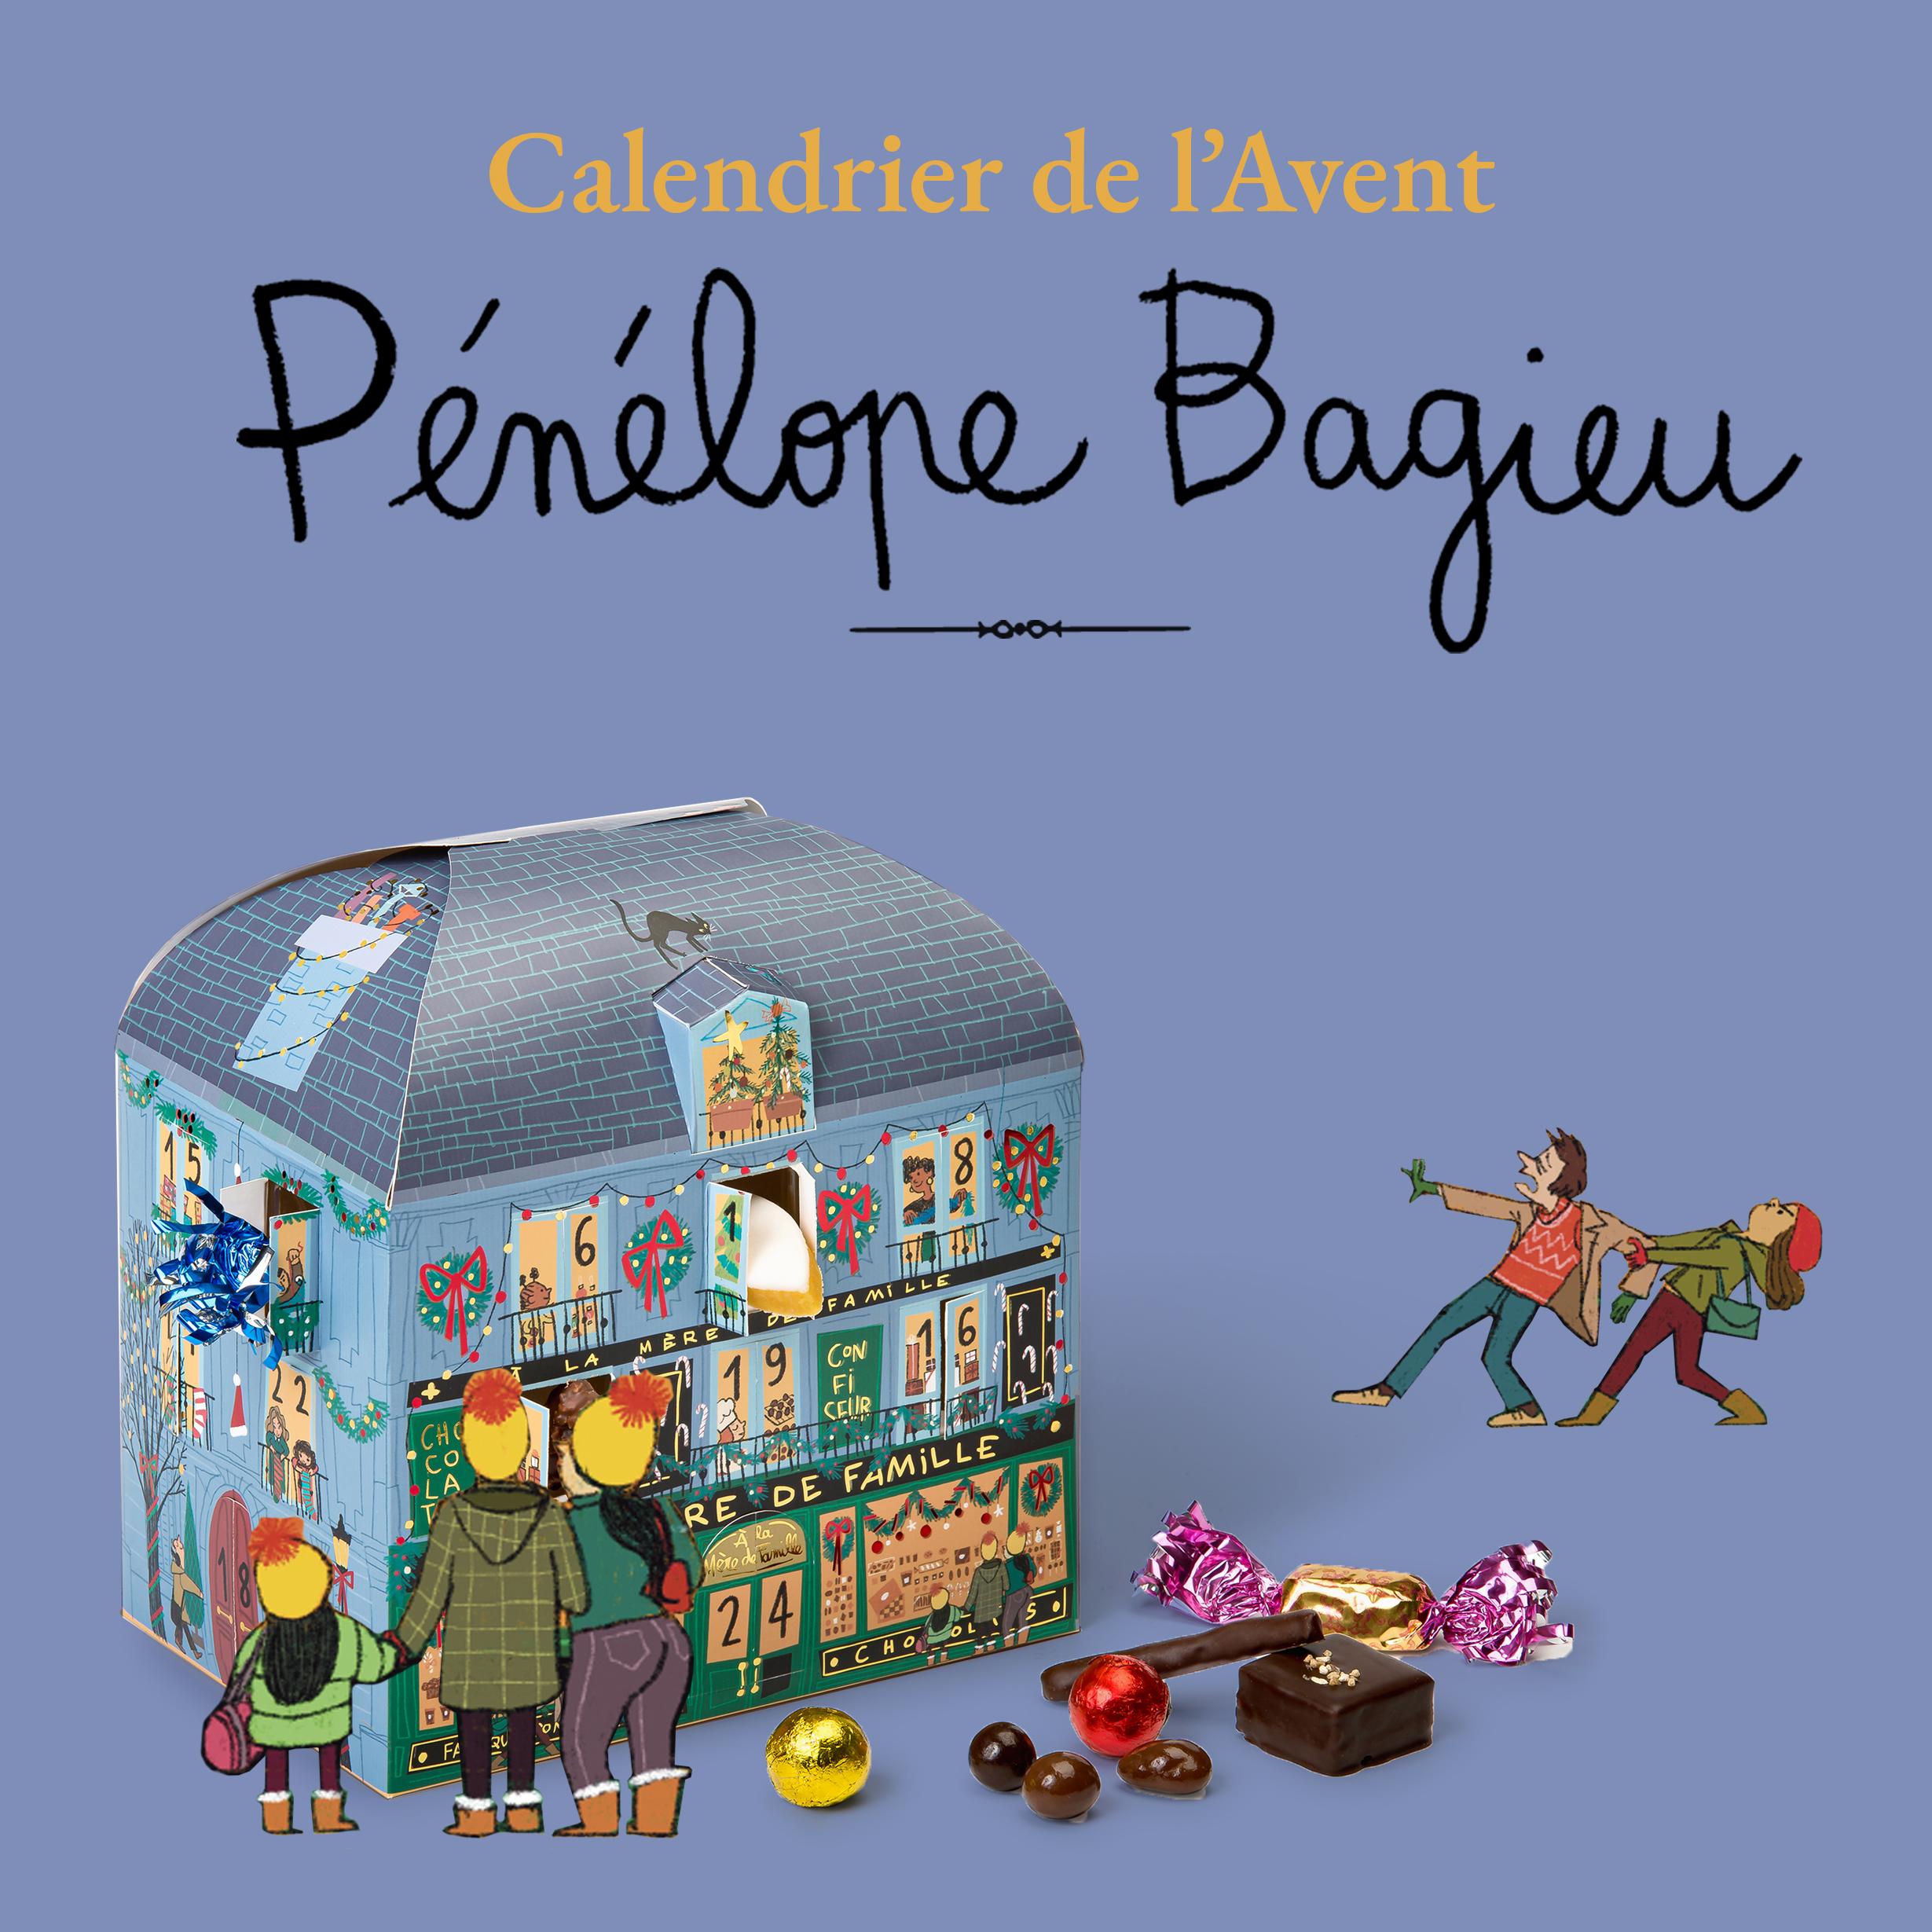 Calendrier de l'Avent 2021 x Pénélope Bagieu